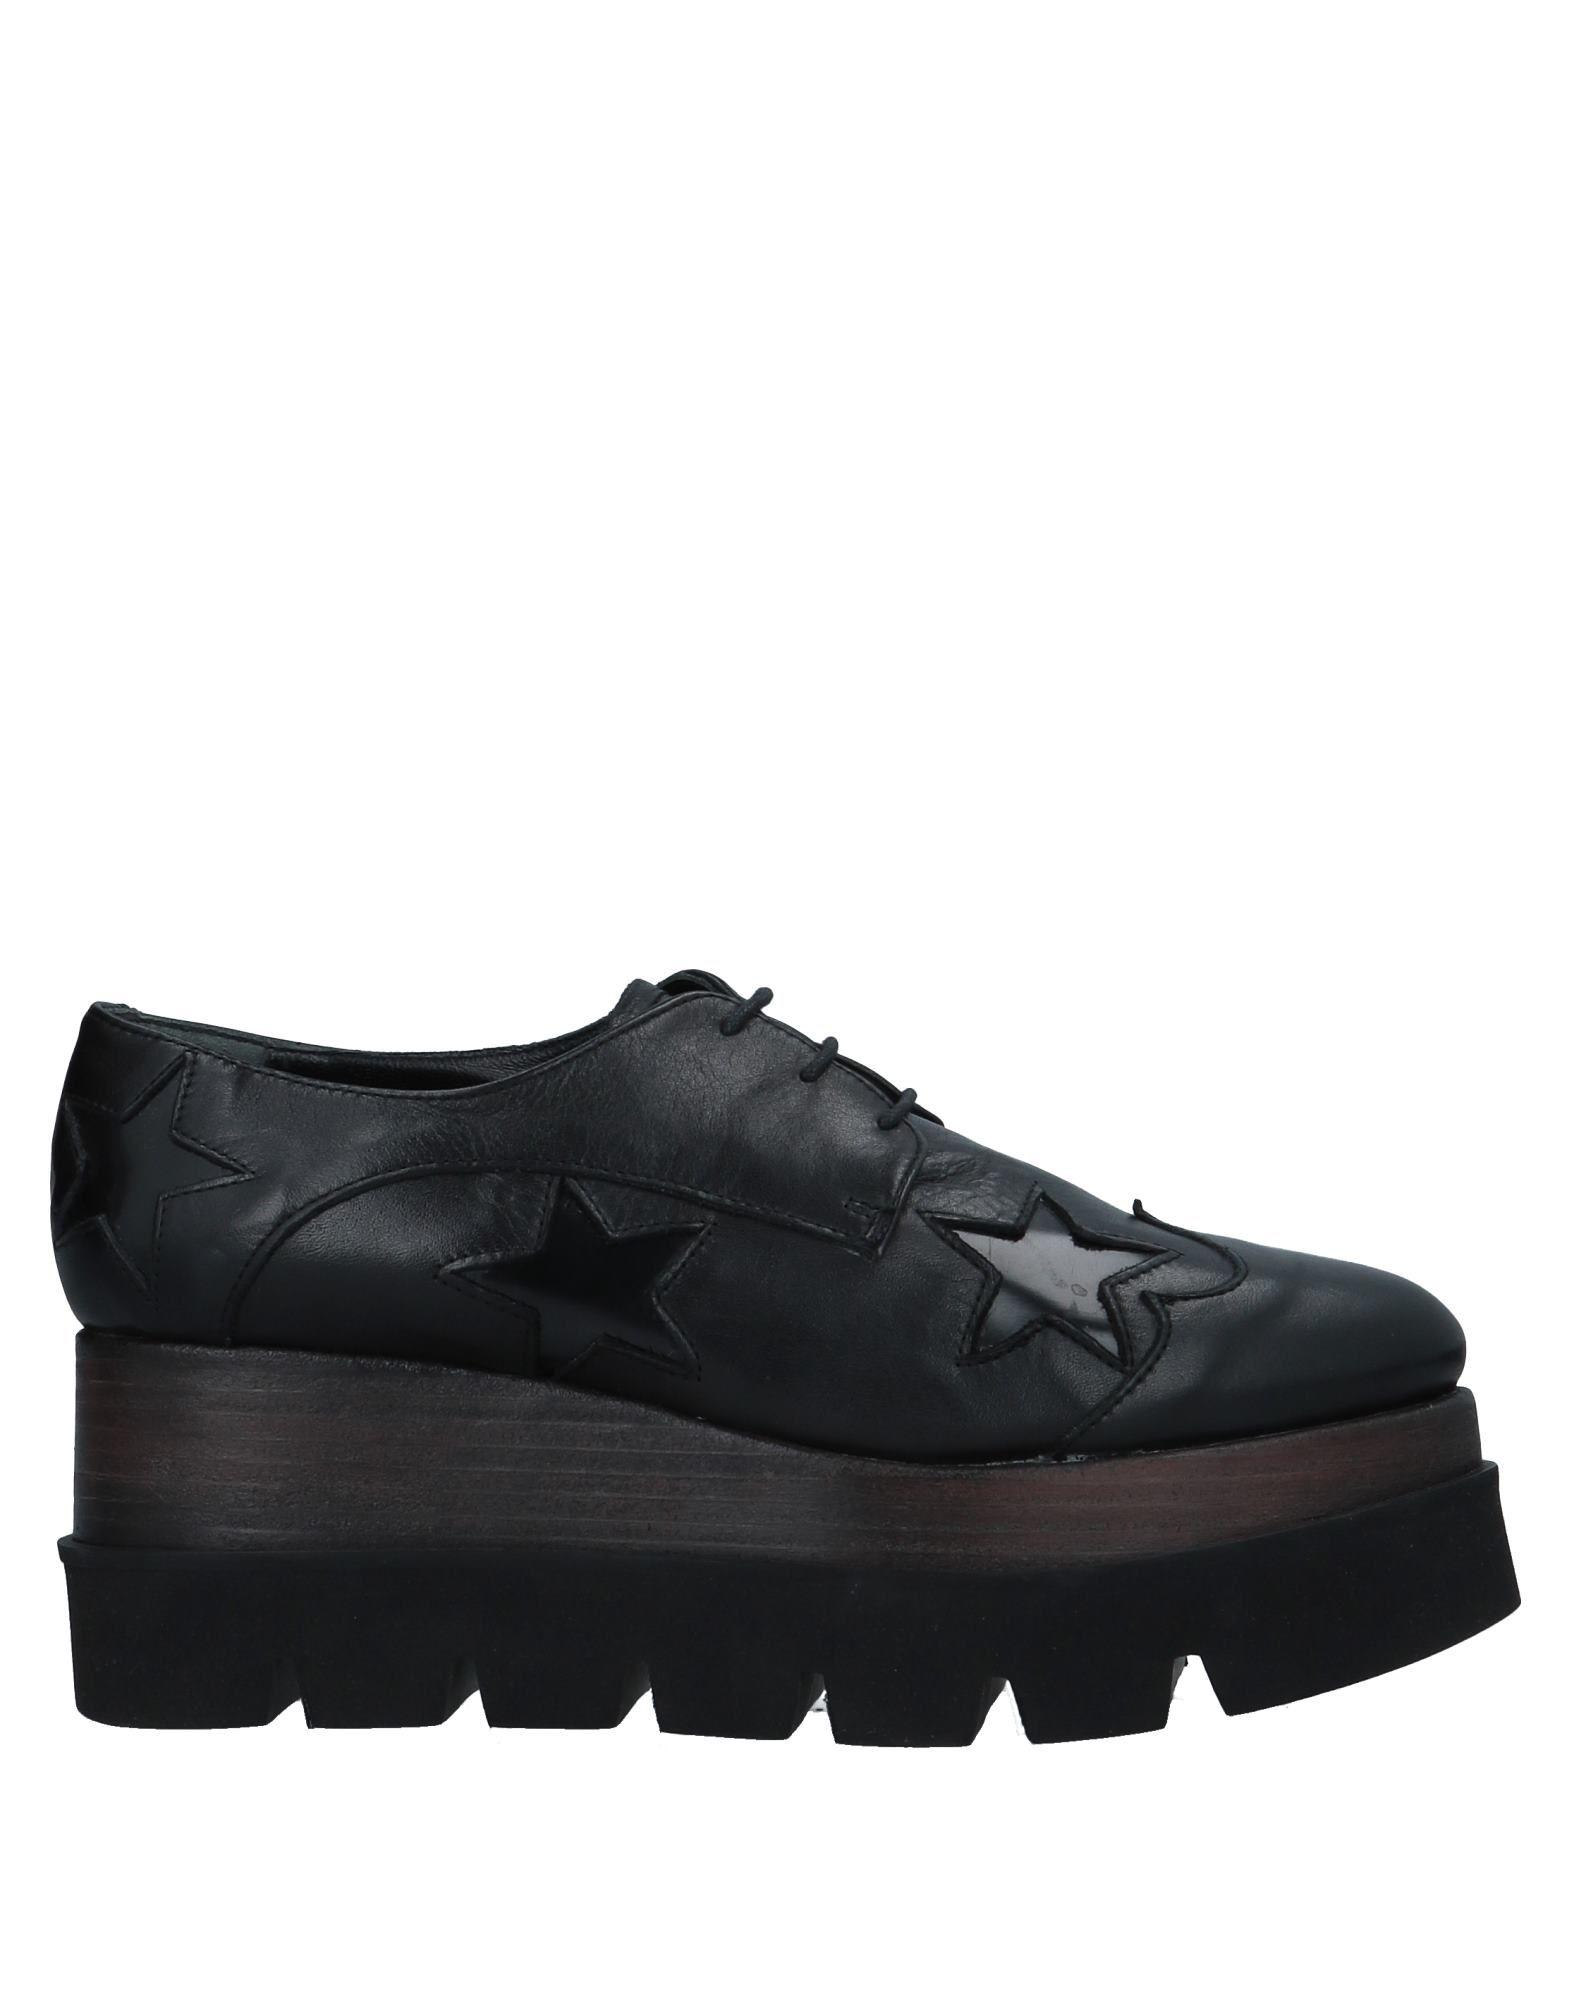 Фото - VIAPANTALEONI® Обувь на шнурках обувь на высокой платформе dkny